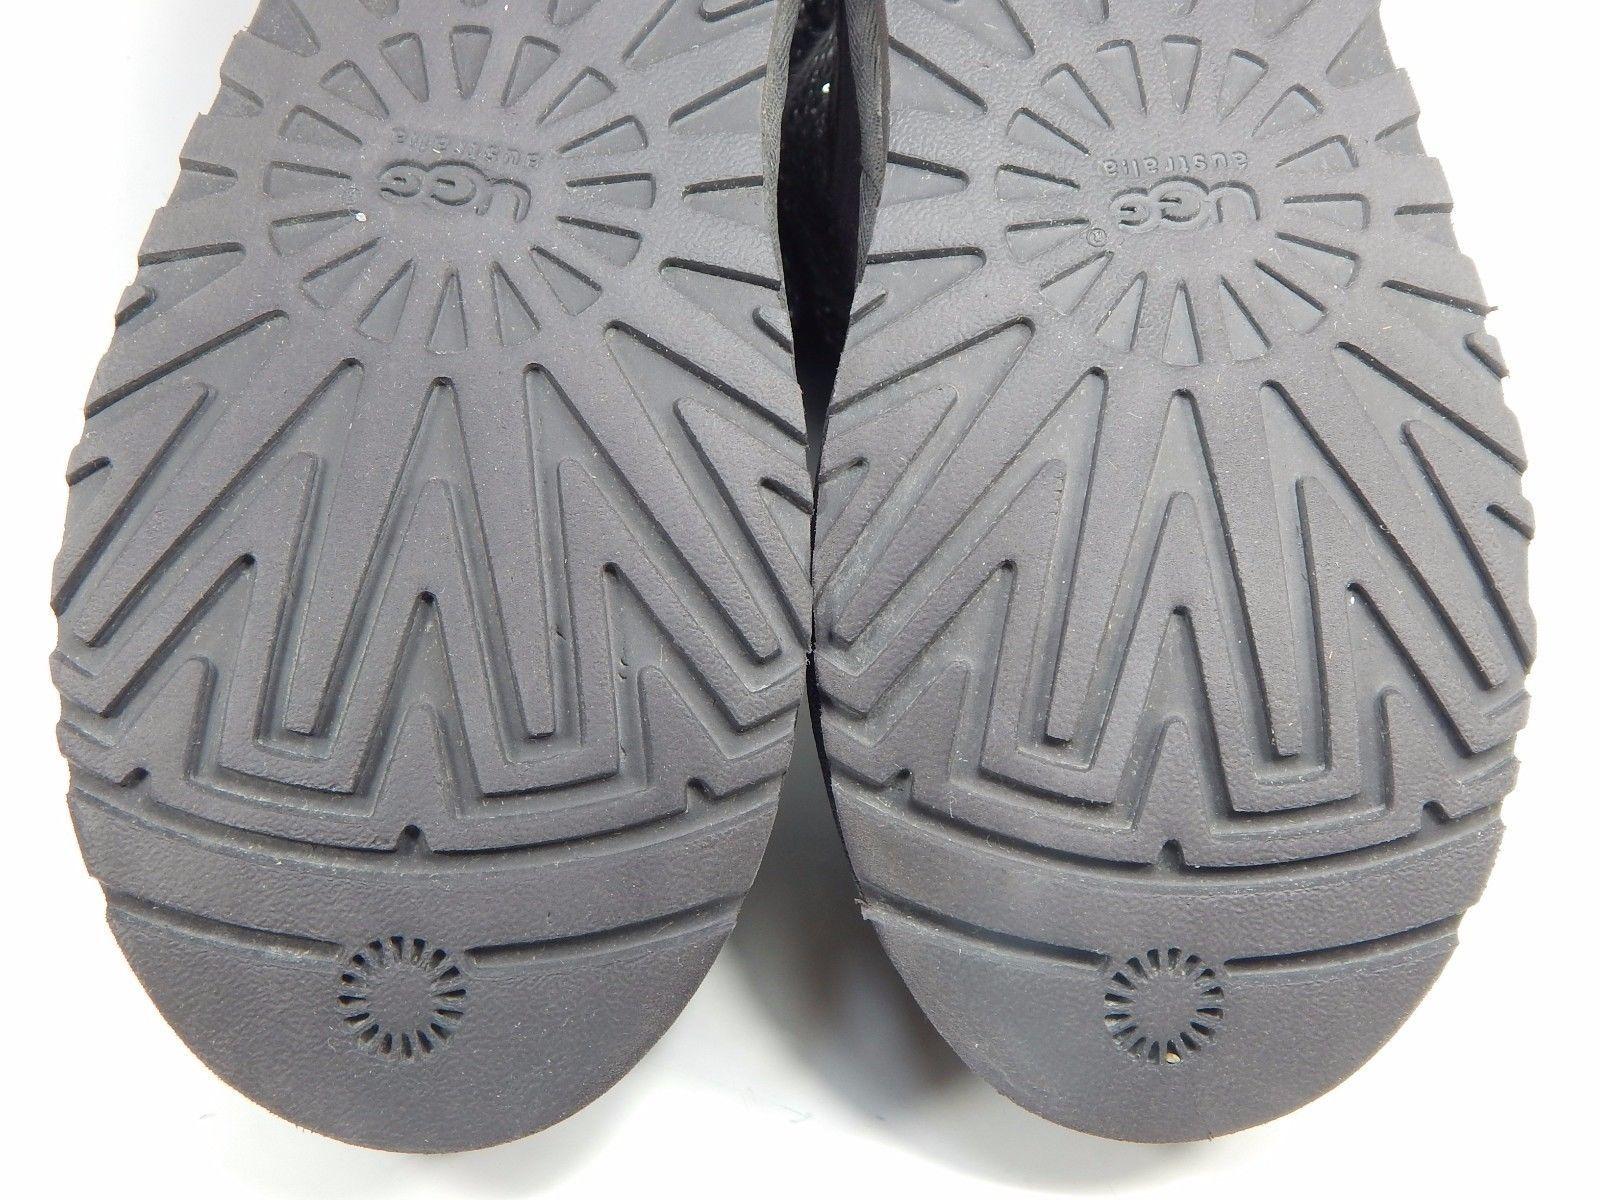 UGG Cambridge Buckle Ankle Boots Size 8 M (B) EU 39 Gray Model # 1006735